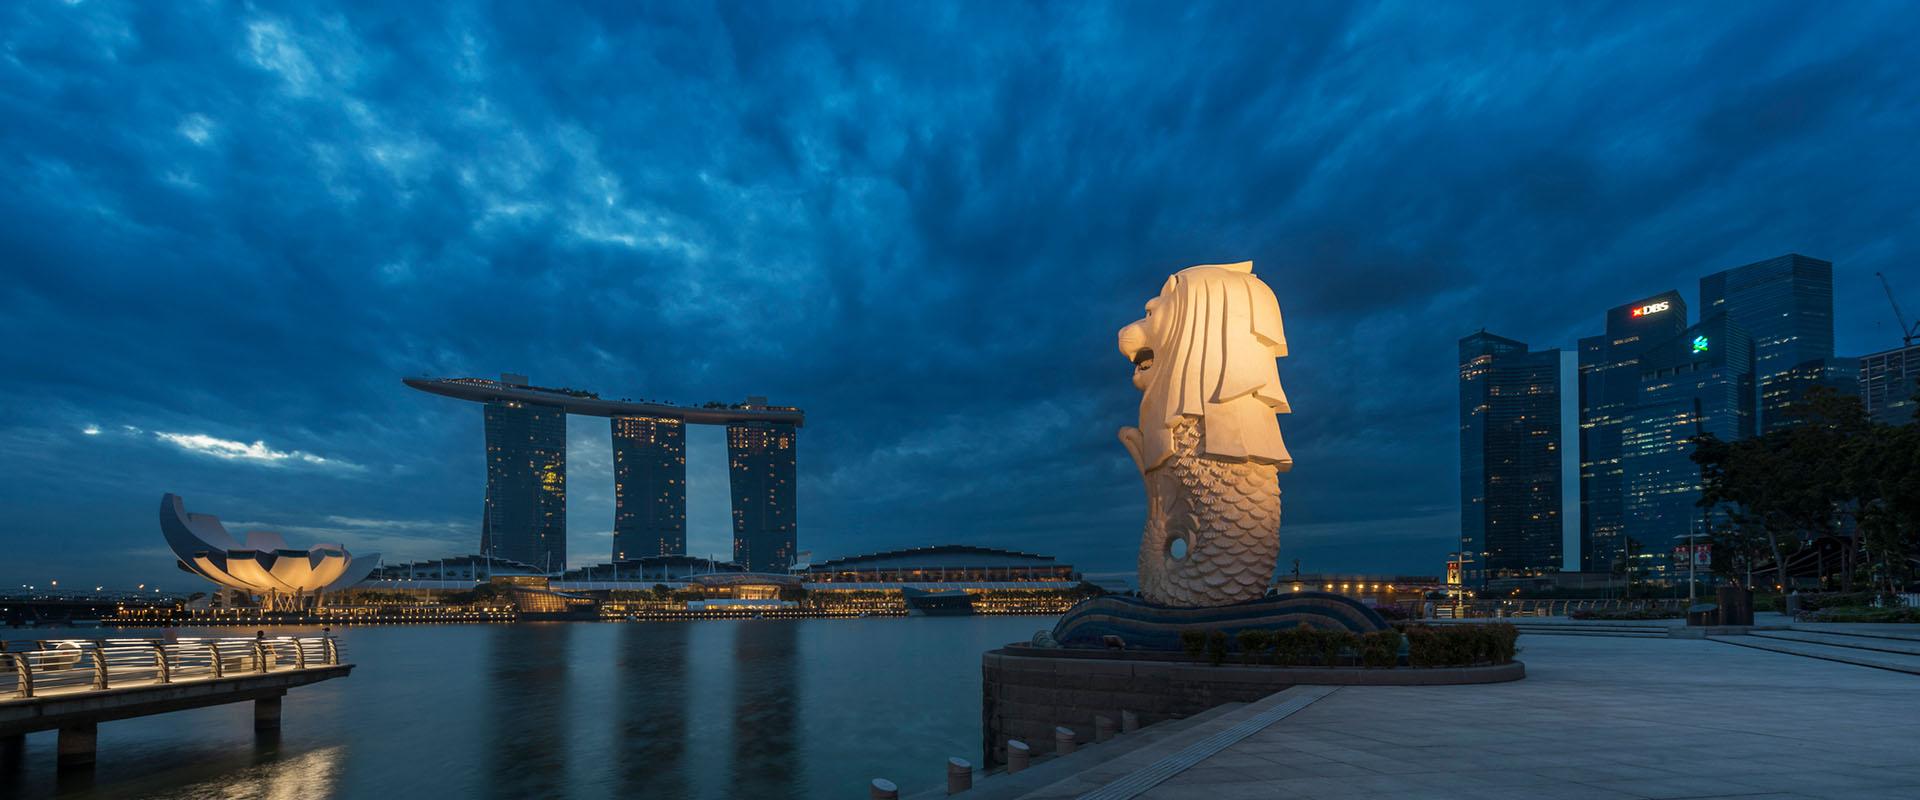 2022, 2023与2024年复活节 - PublicHolidays.sg